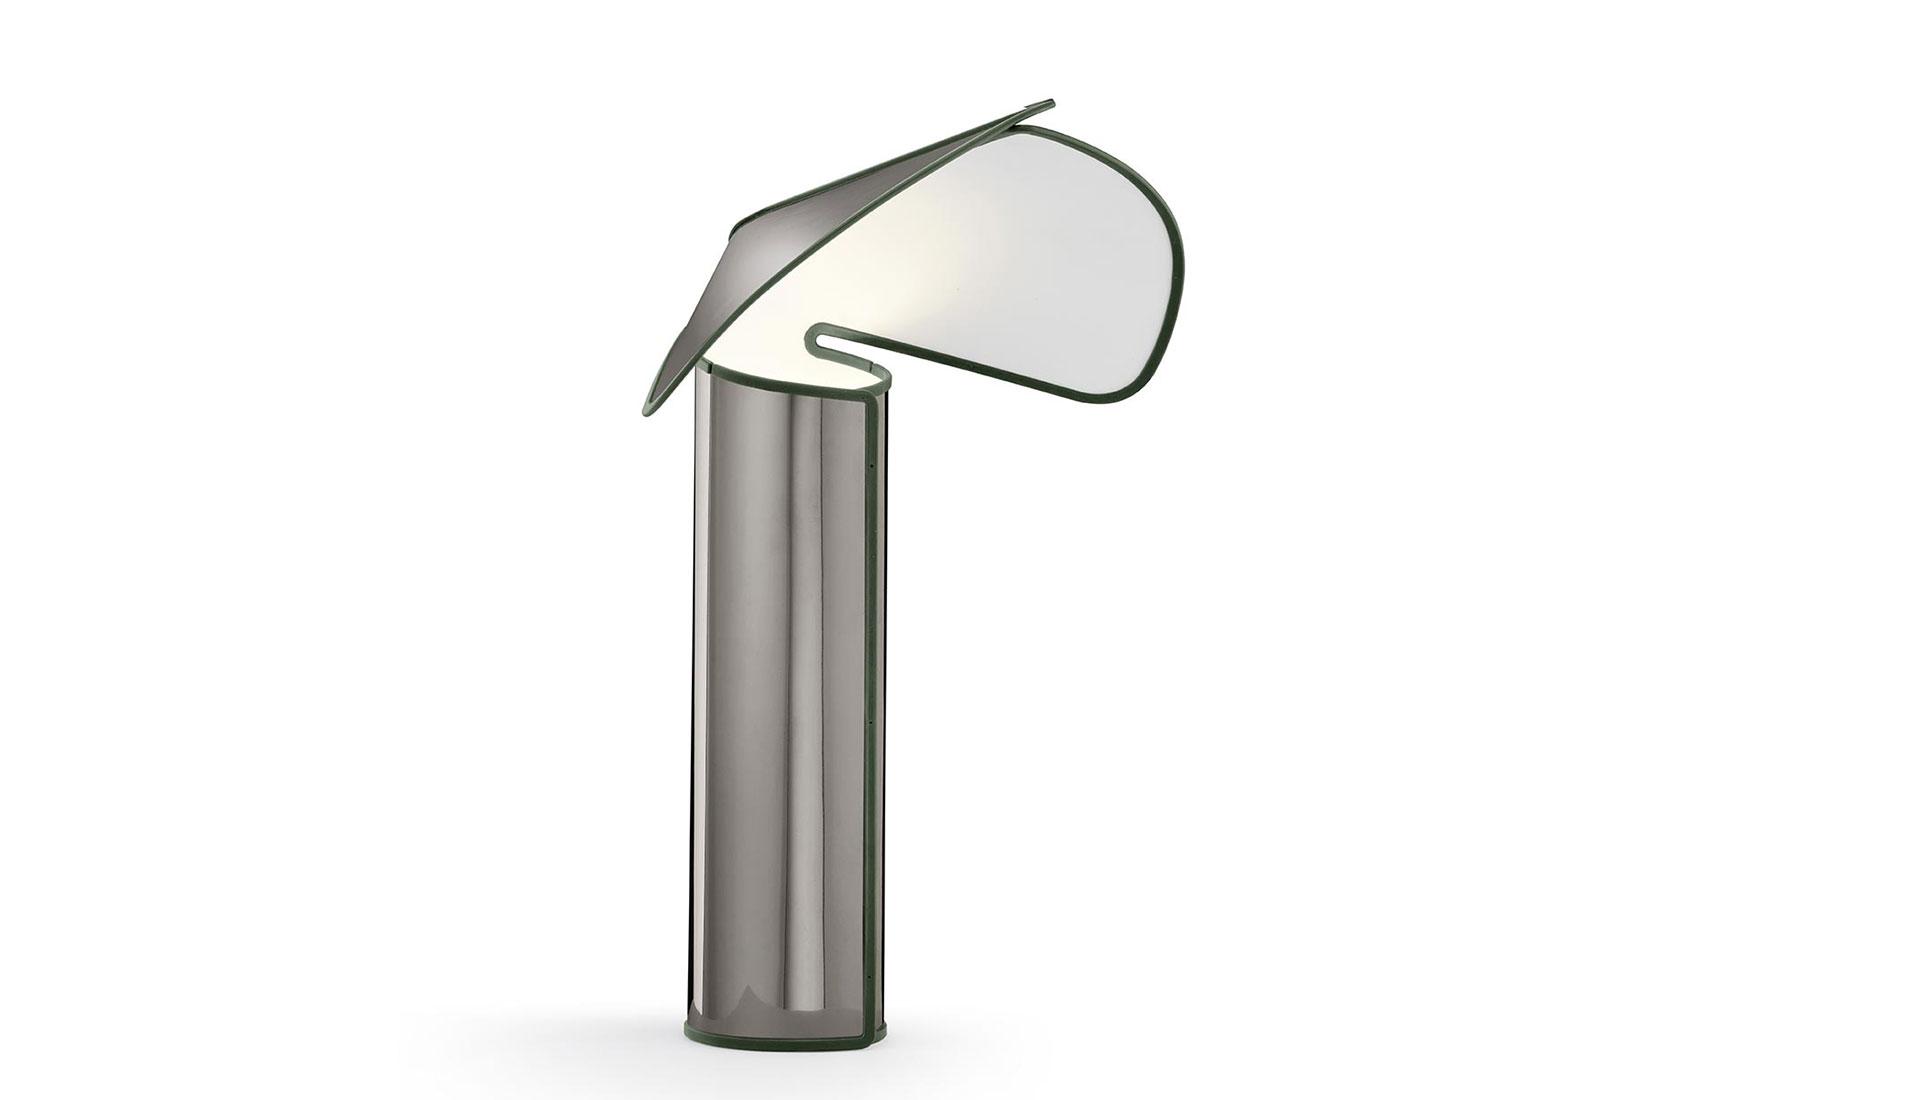 светильник Chiara Марио Беллини фото